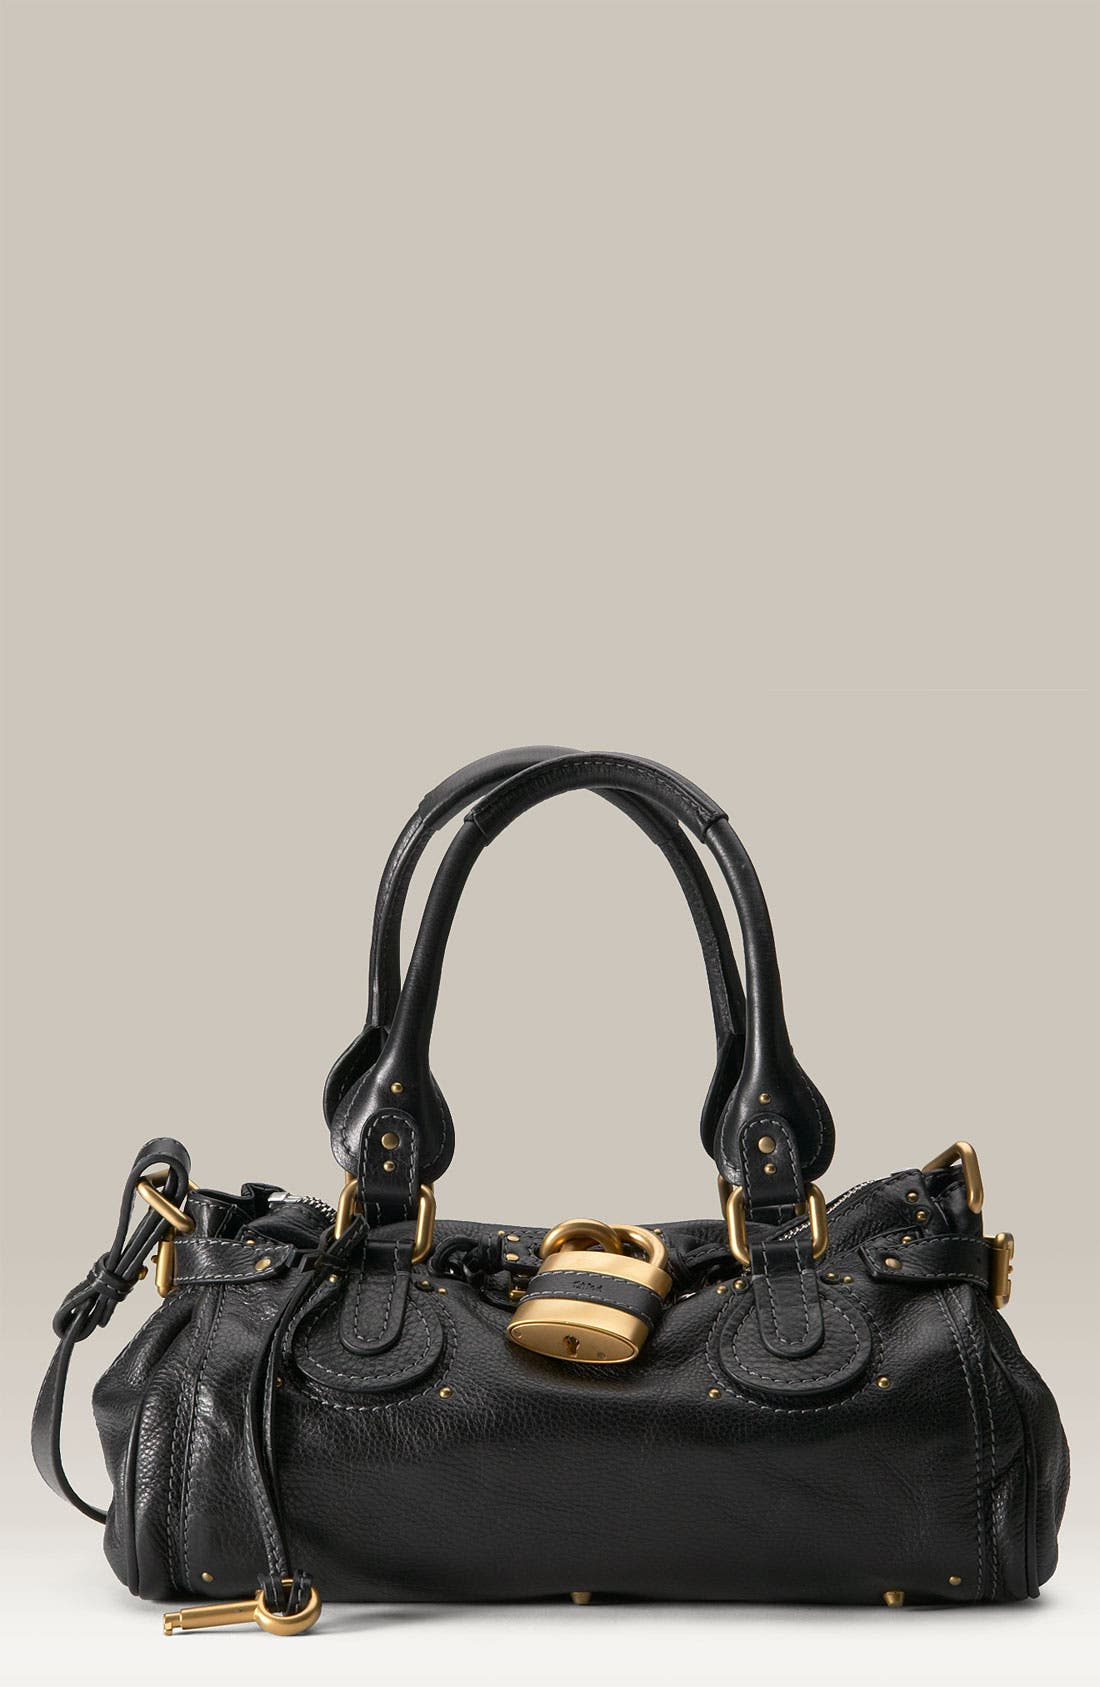 Main Image - Chloé 'Paddington' Leather Padlock Satchel